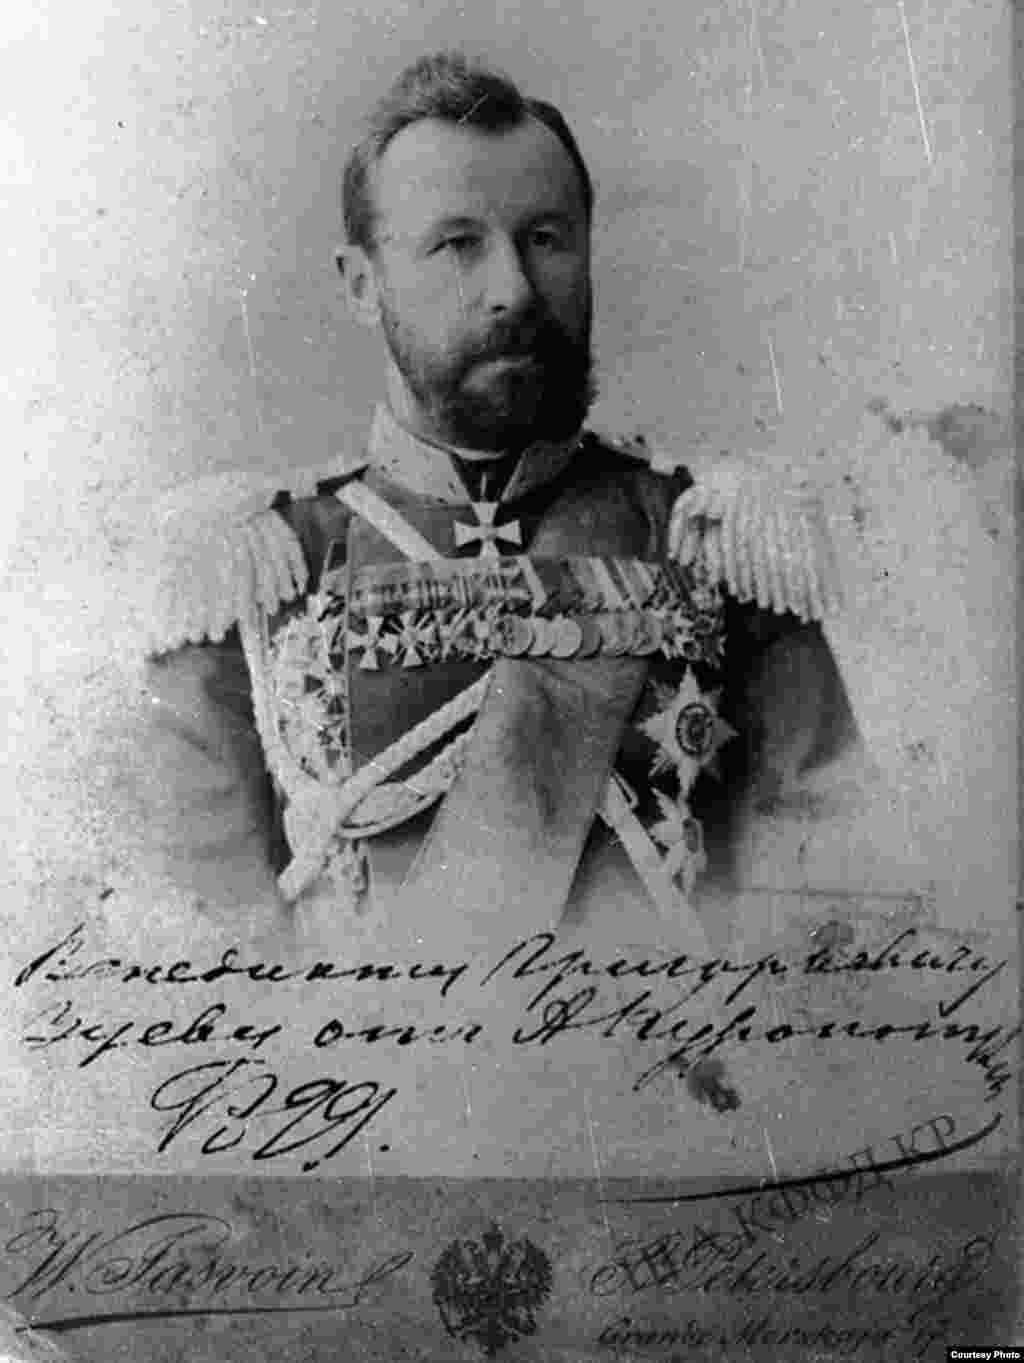 А. Куропаткин, генерал-губернатор Туркестанского края. 1899 год.